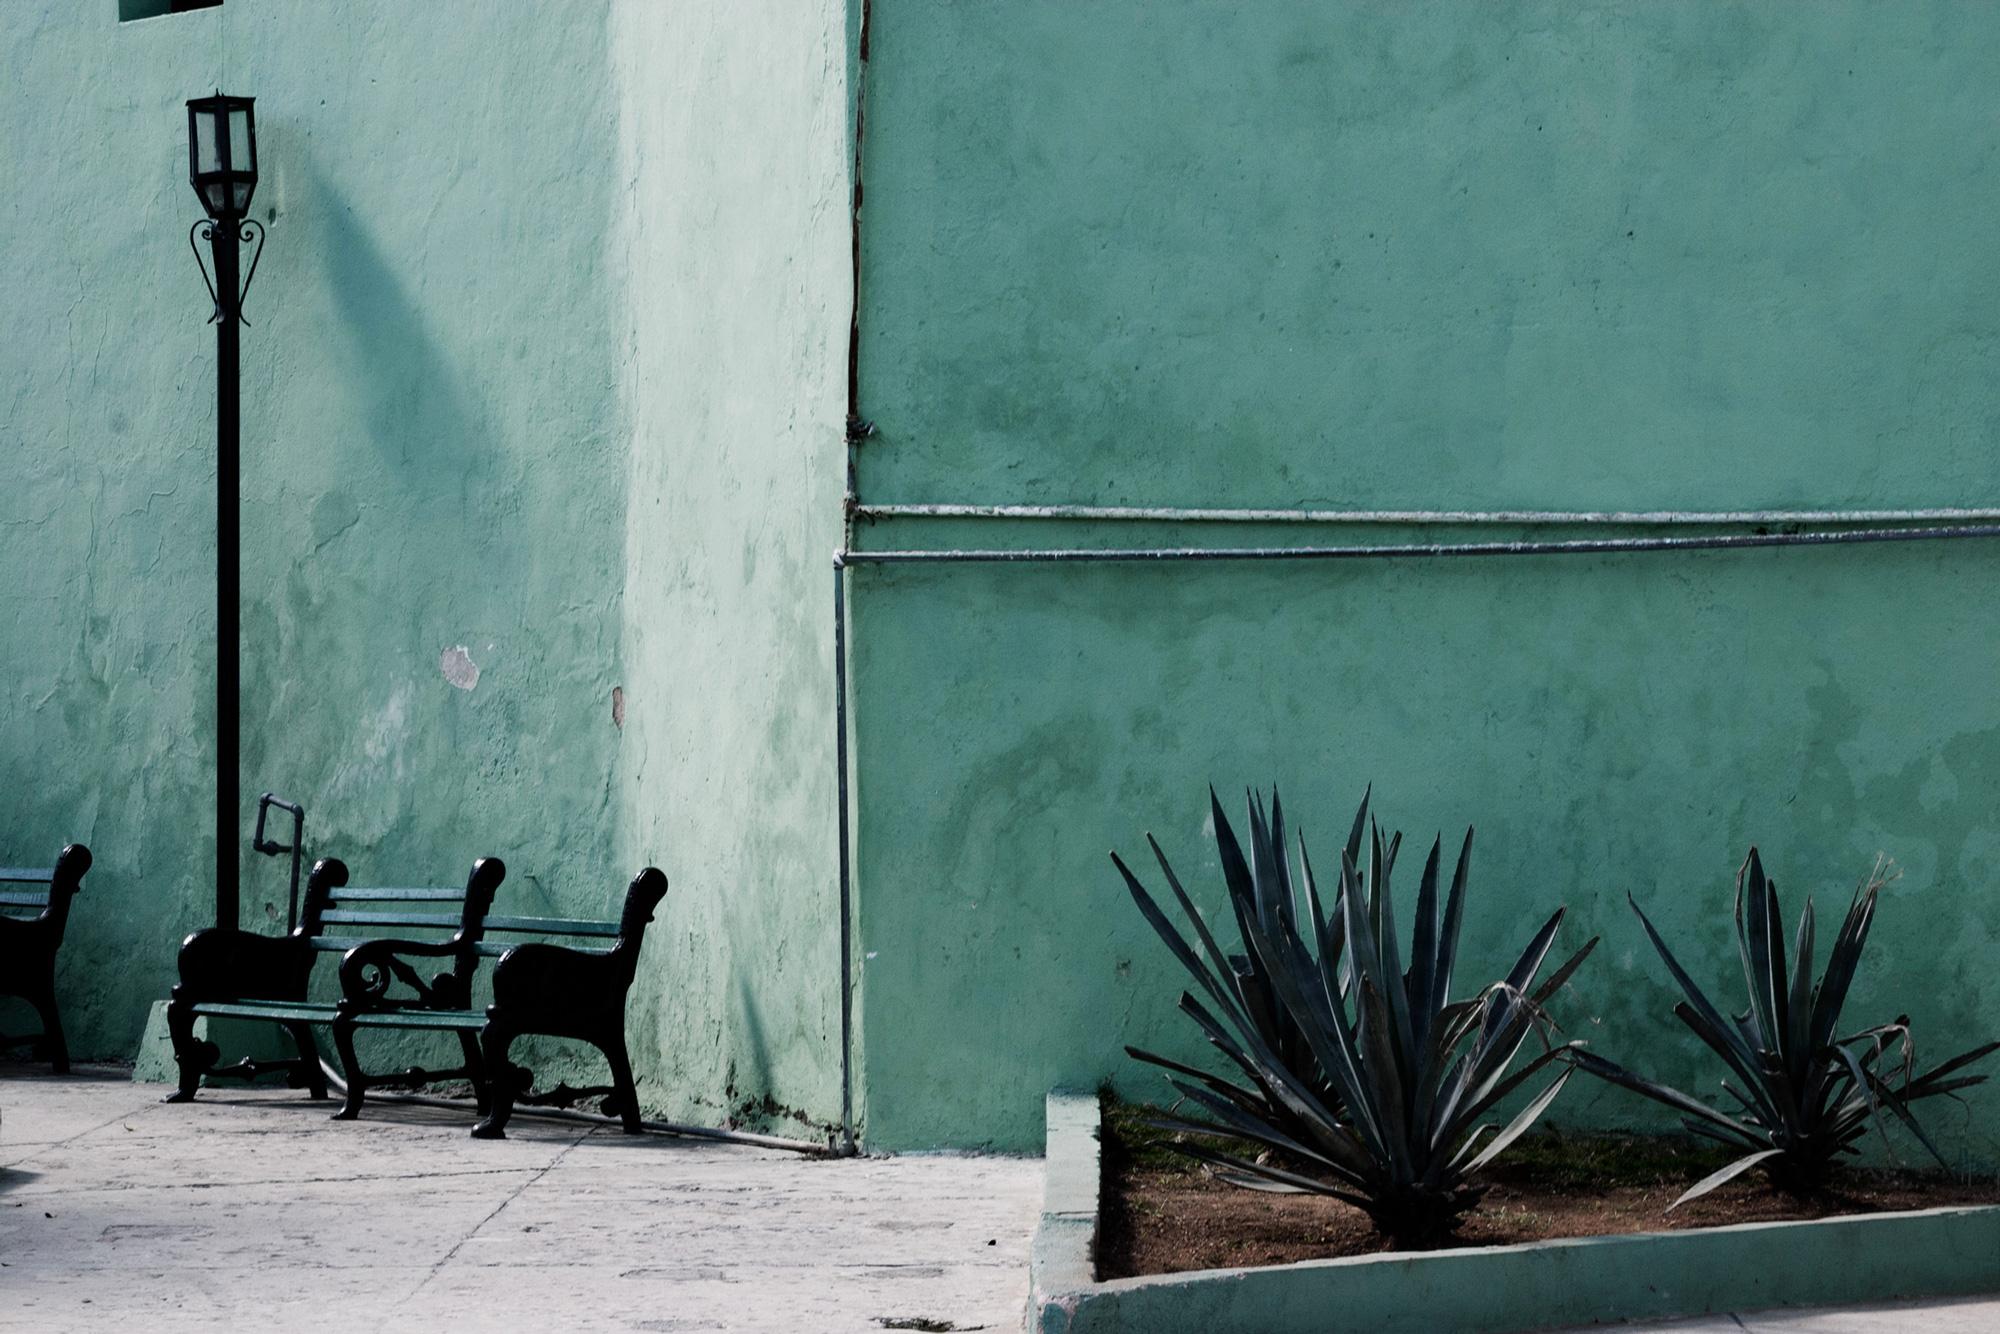 cuba mur vert banc plantes